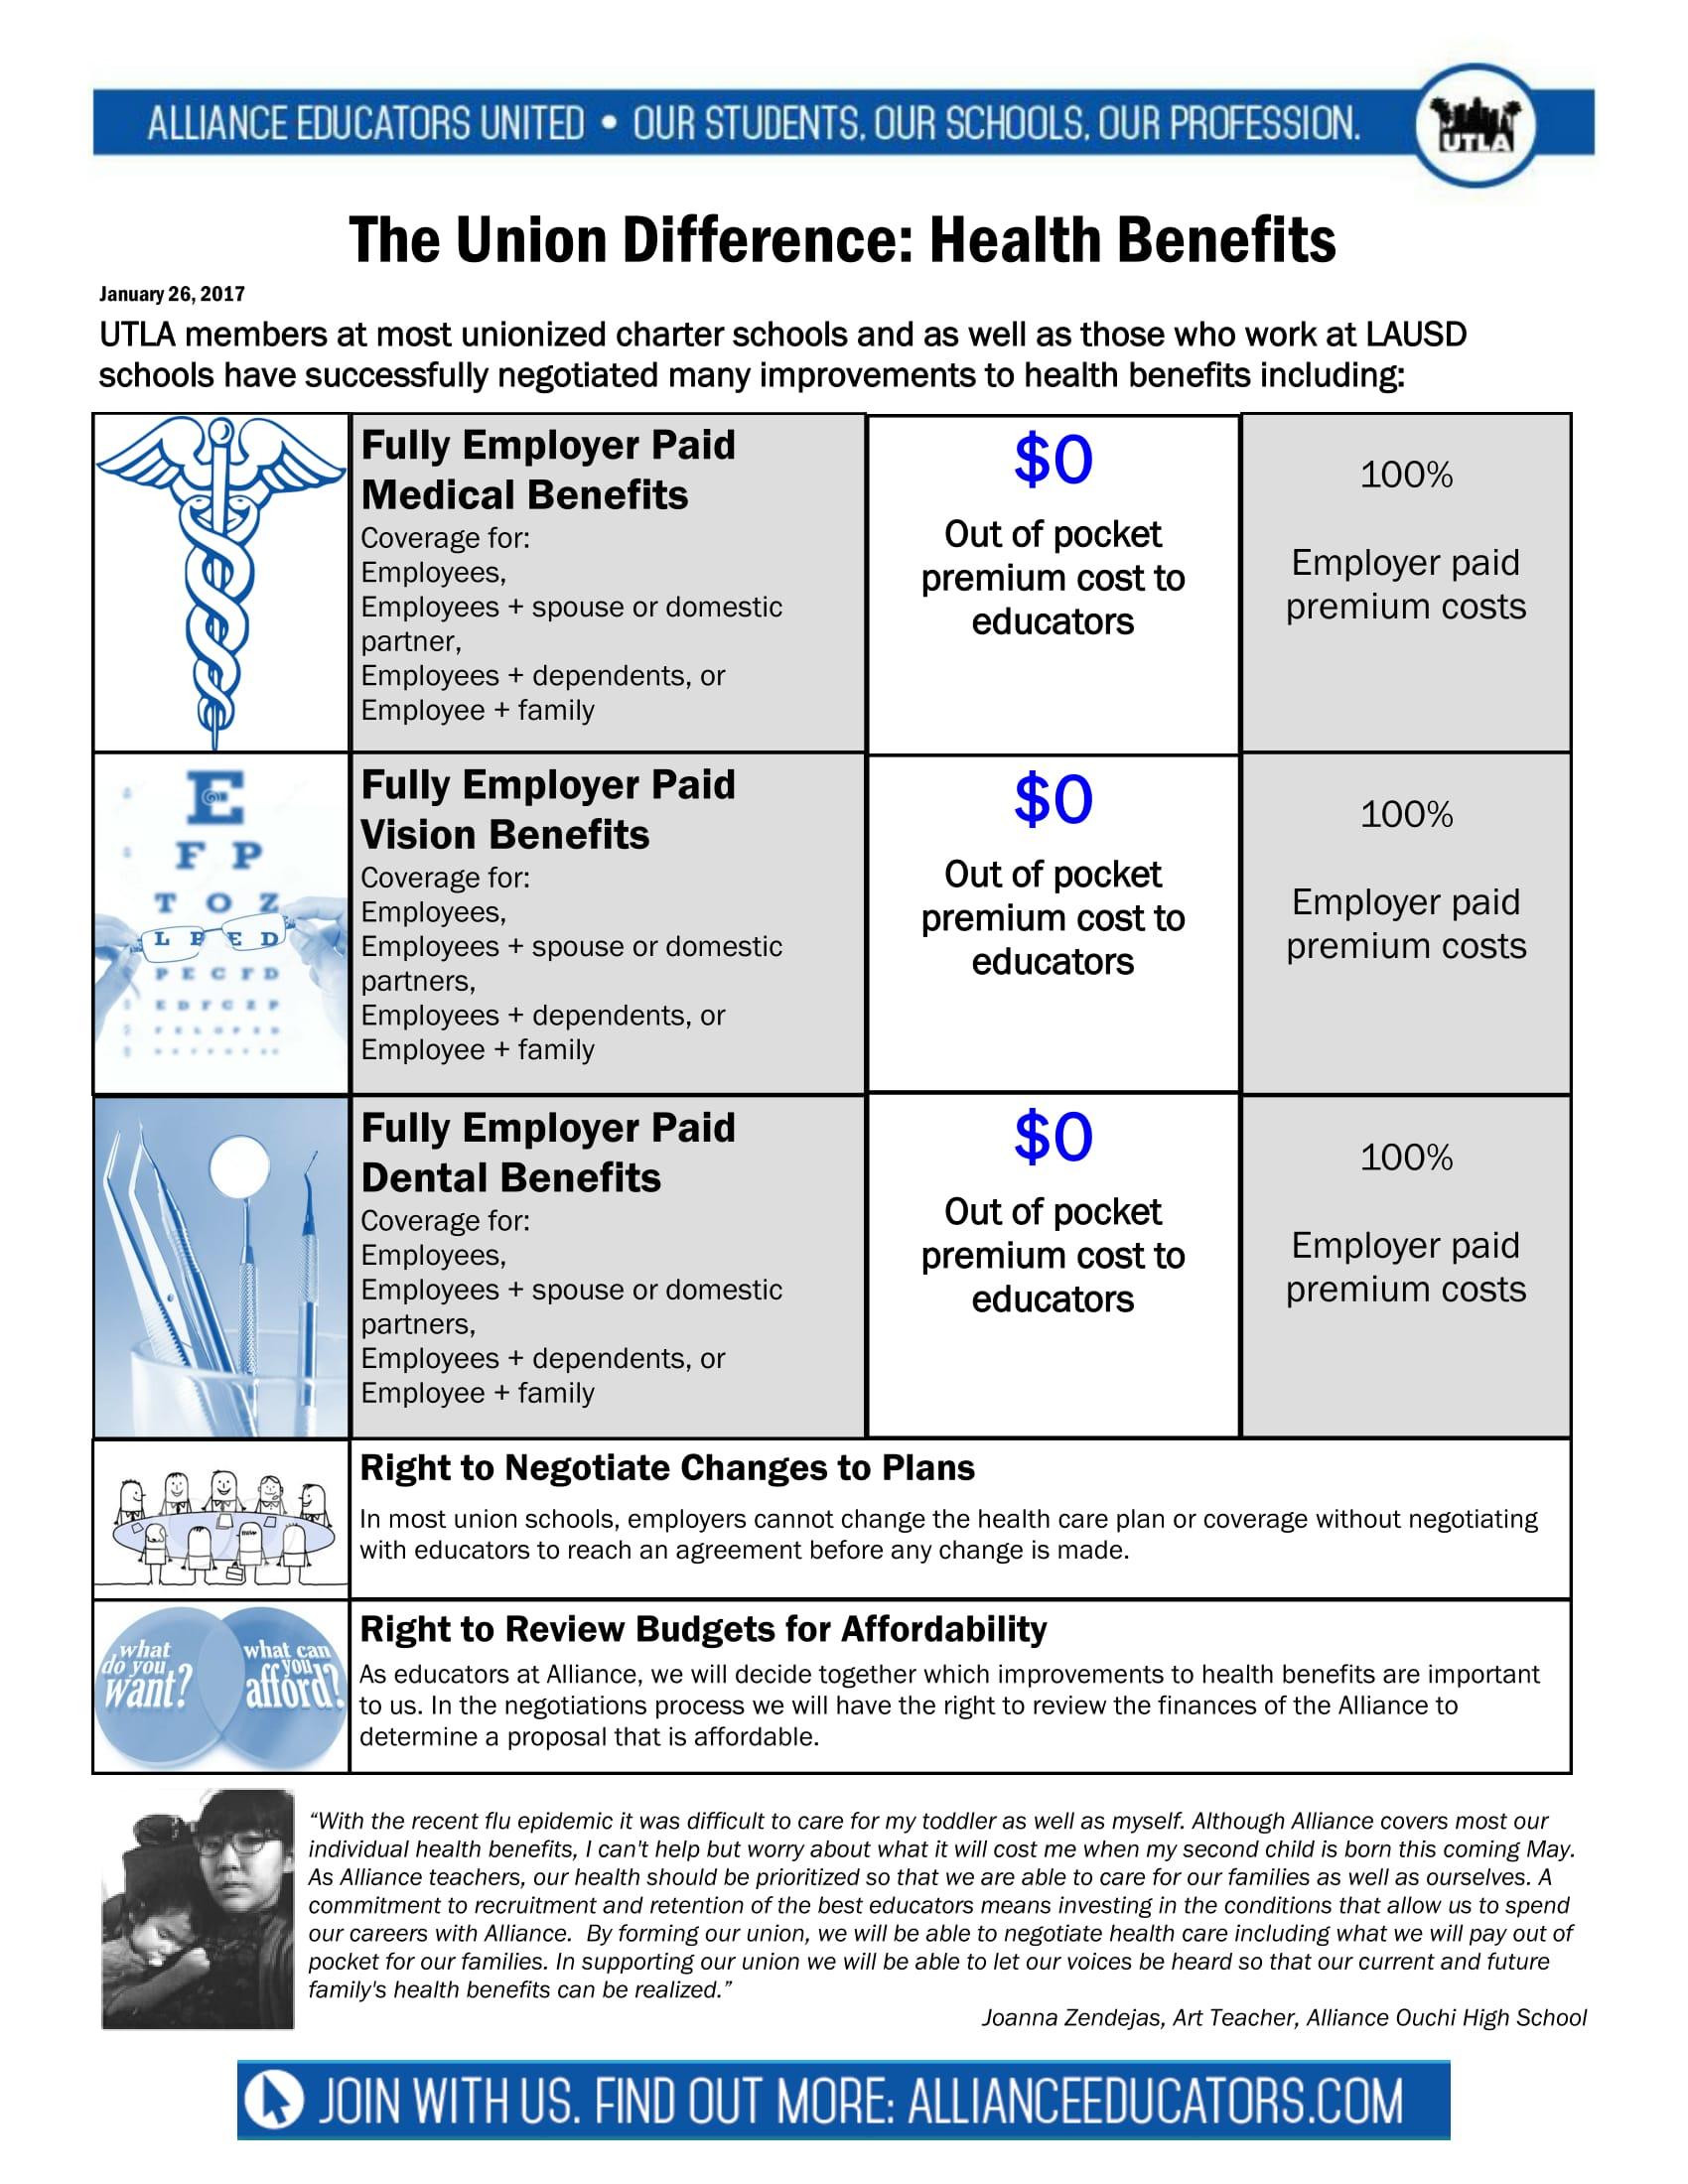 2017-01-27 Alliance Health Benefits Leaflet 1-2